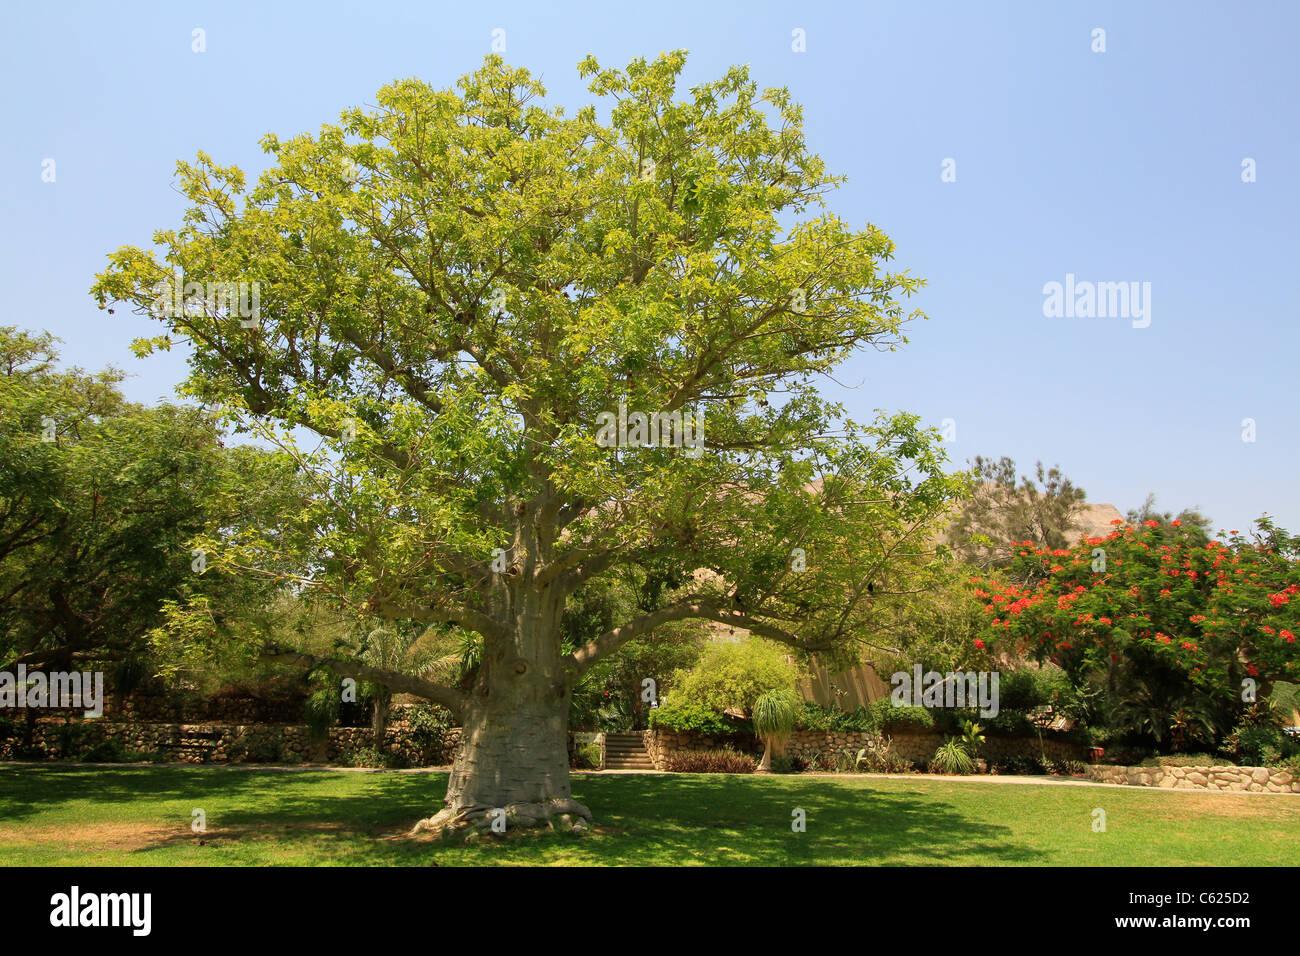 Israel, Totes Meer-Tal, Baobab-Baum in Kibbutz Ein Gedi Stockfoto